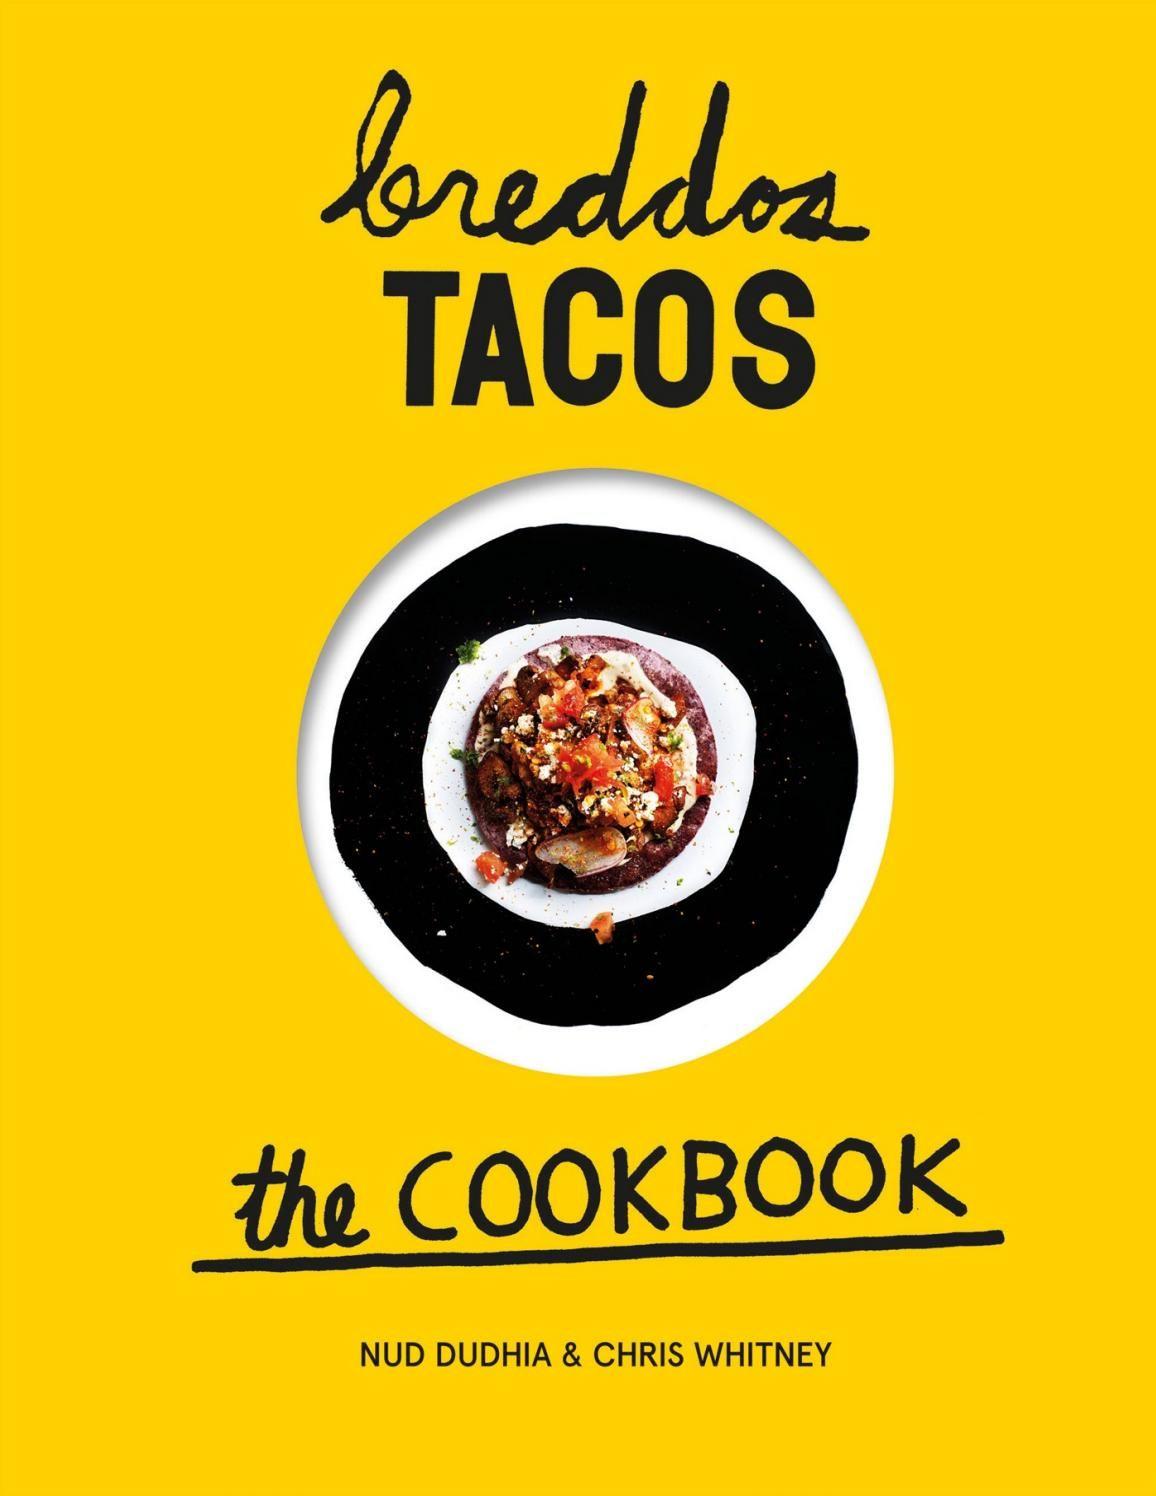 Breddos tacos the cookbook issuu pdf download 7 pinterest breddos tacos the cookbook issuu pdf download forumfinder Gallery